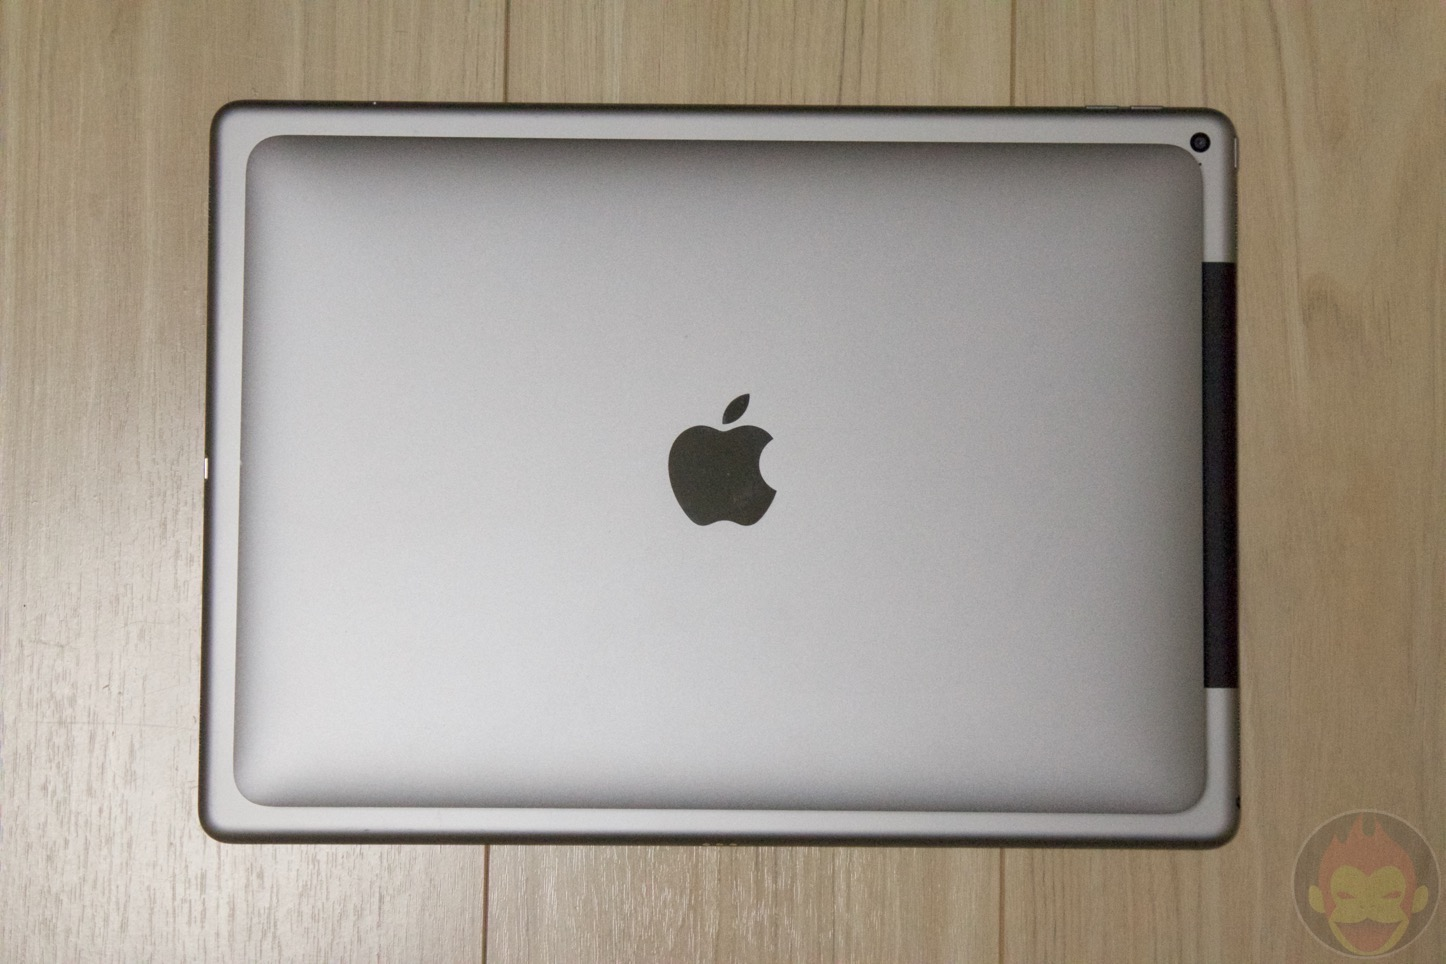 iPad-Pro-Review-MacBook-Comparison-05.jpg